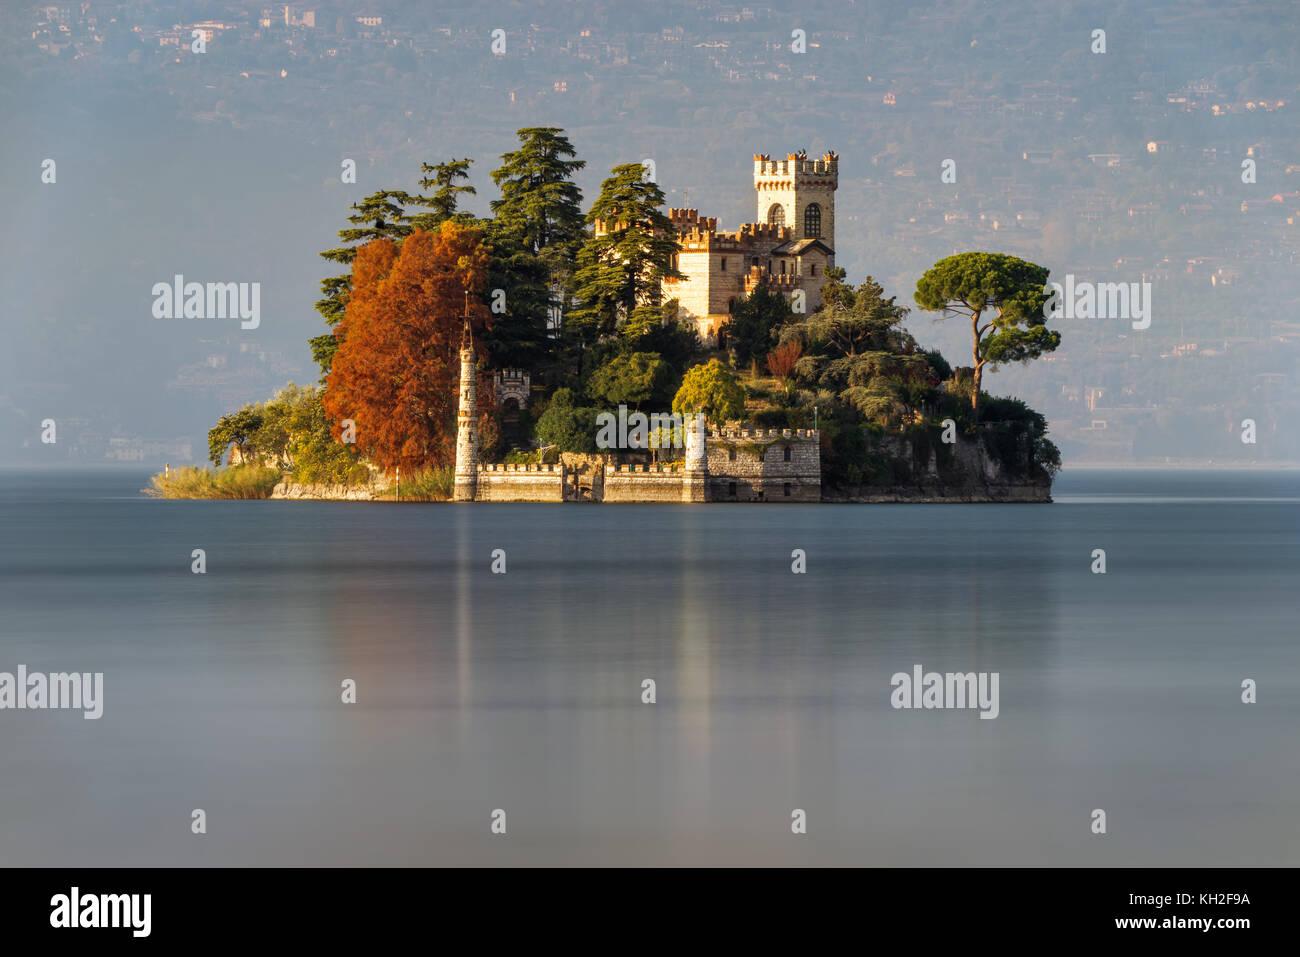 Little island Isola di Loreto on Iseo Lake, Italy - Stock Image